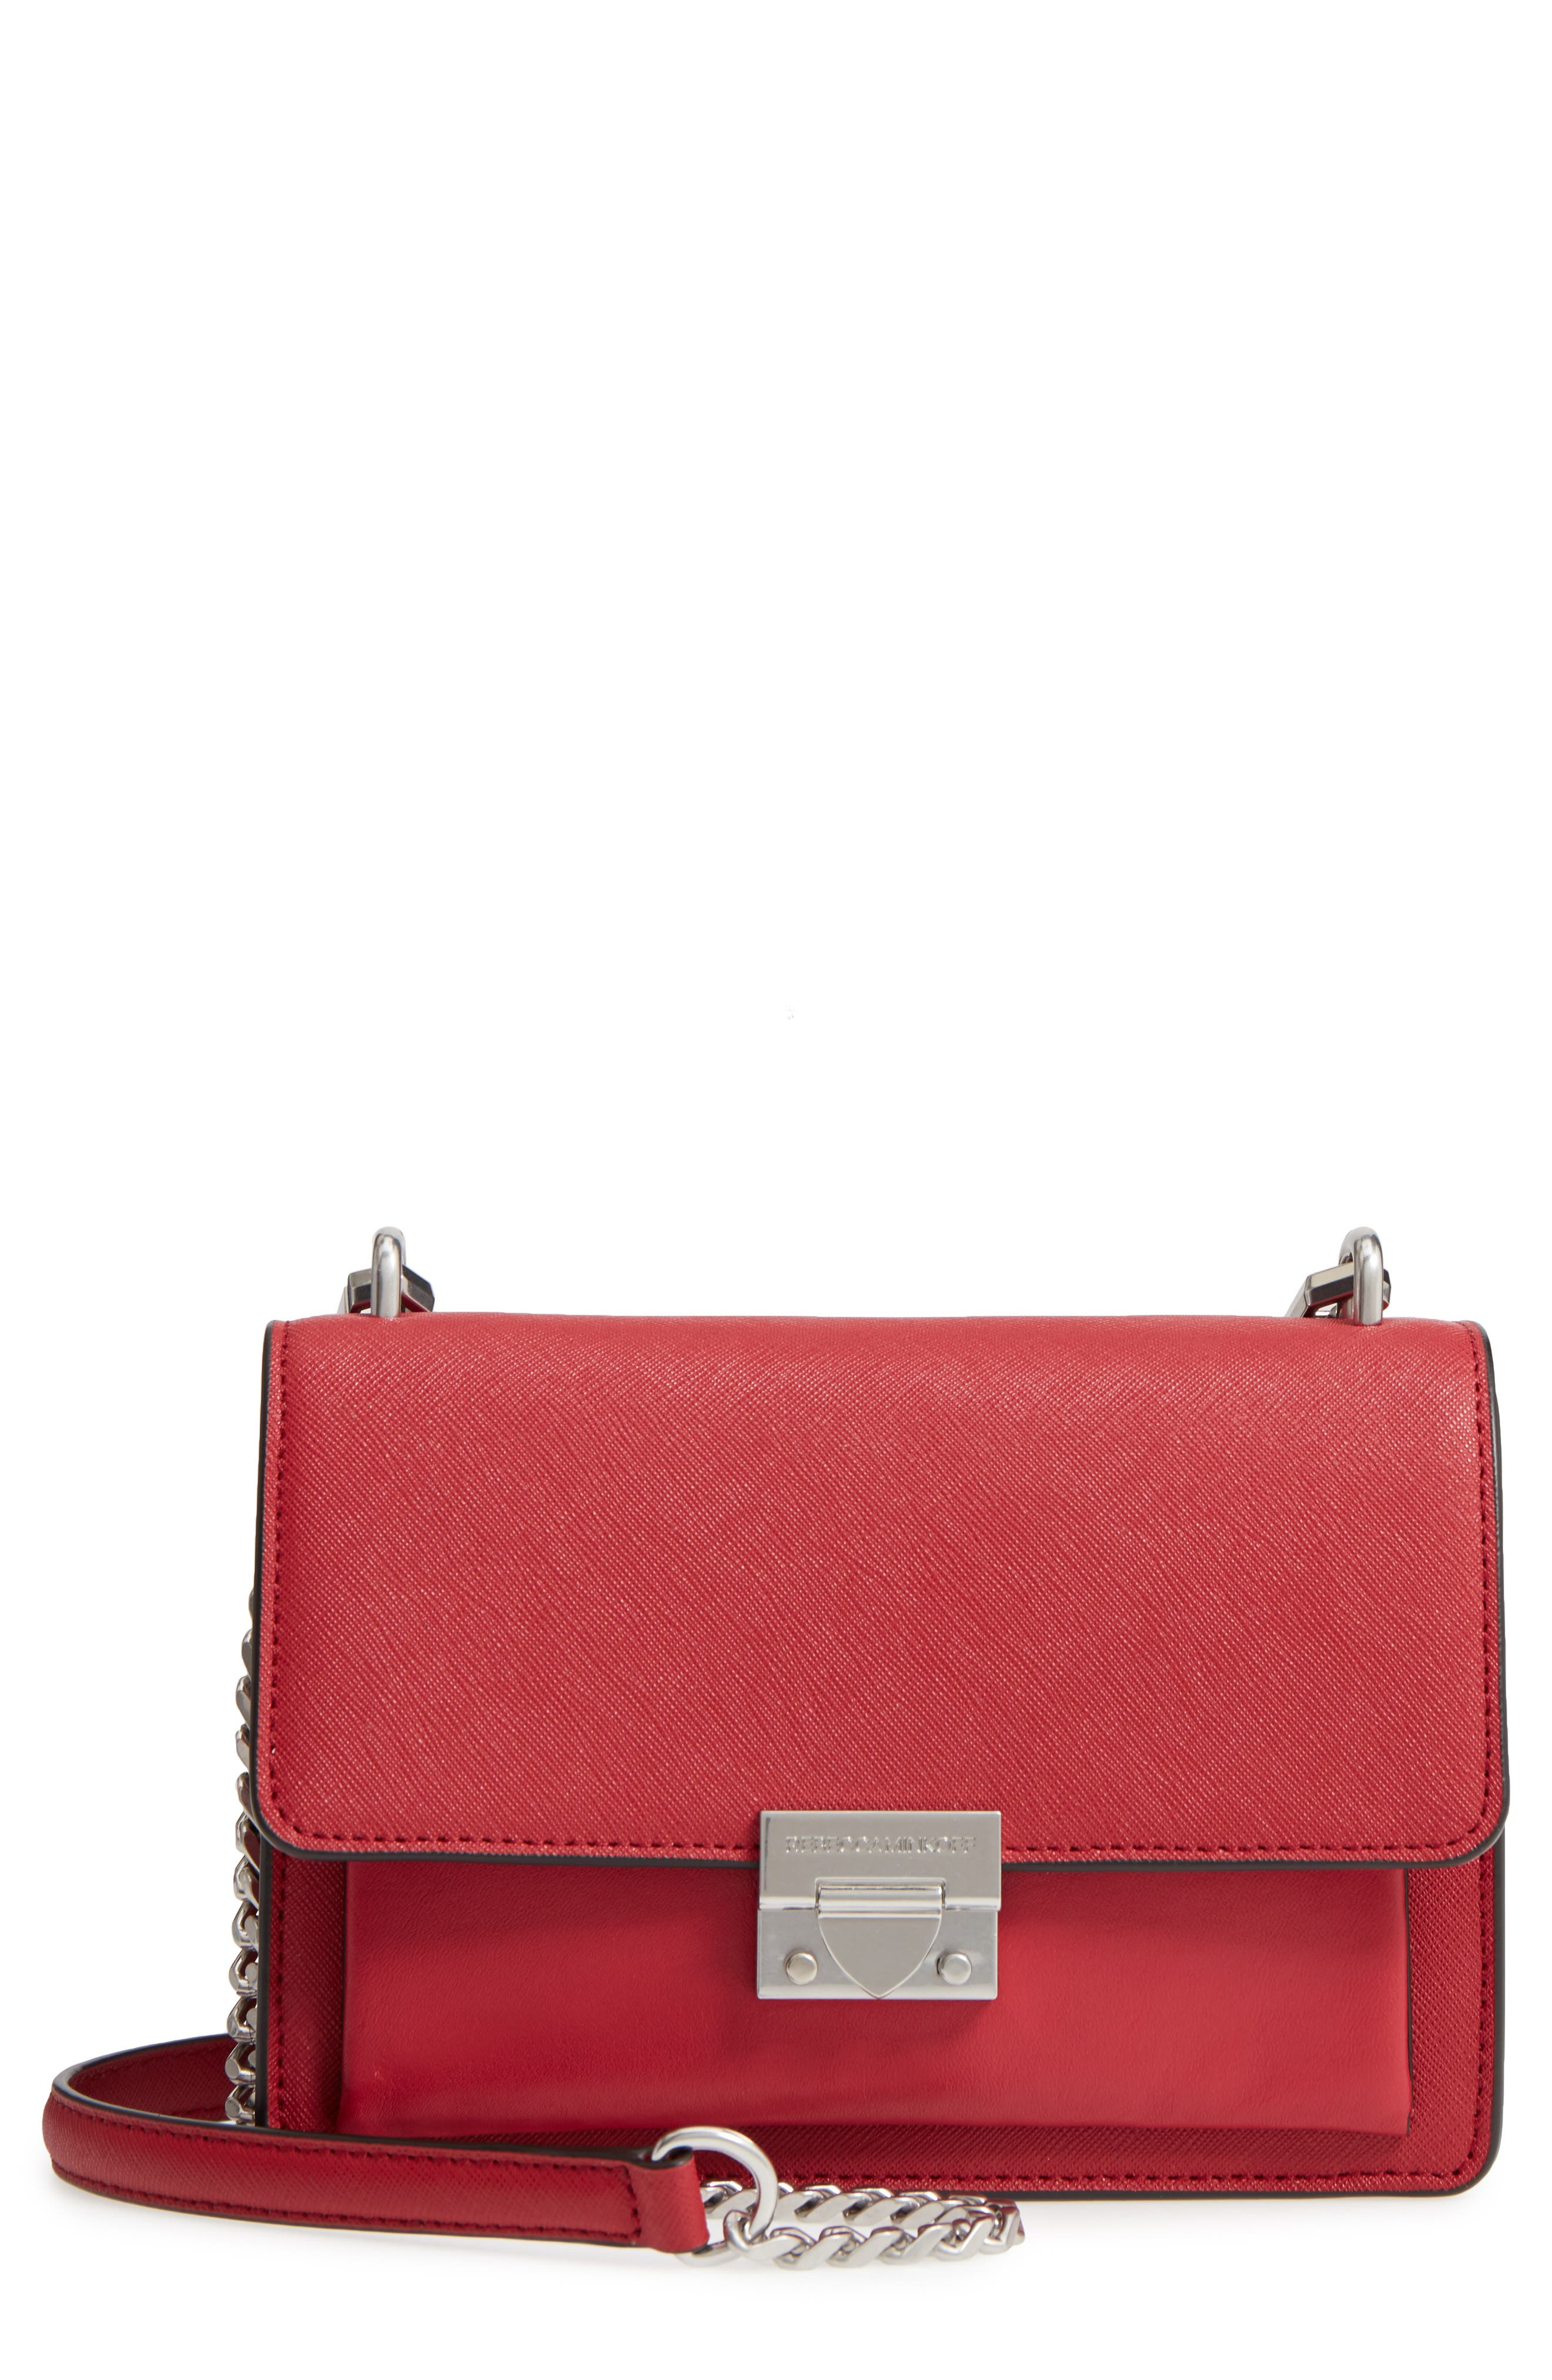 Medium Christy Leather Shoulder Bag,                             Main thumbnail 4, color,